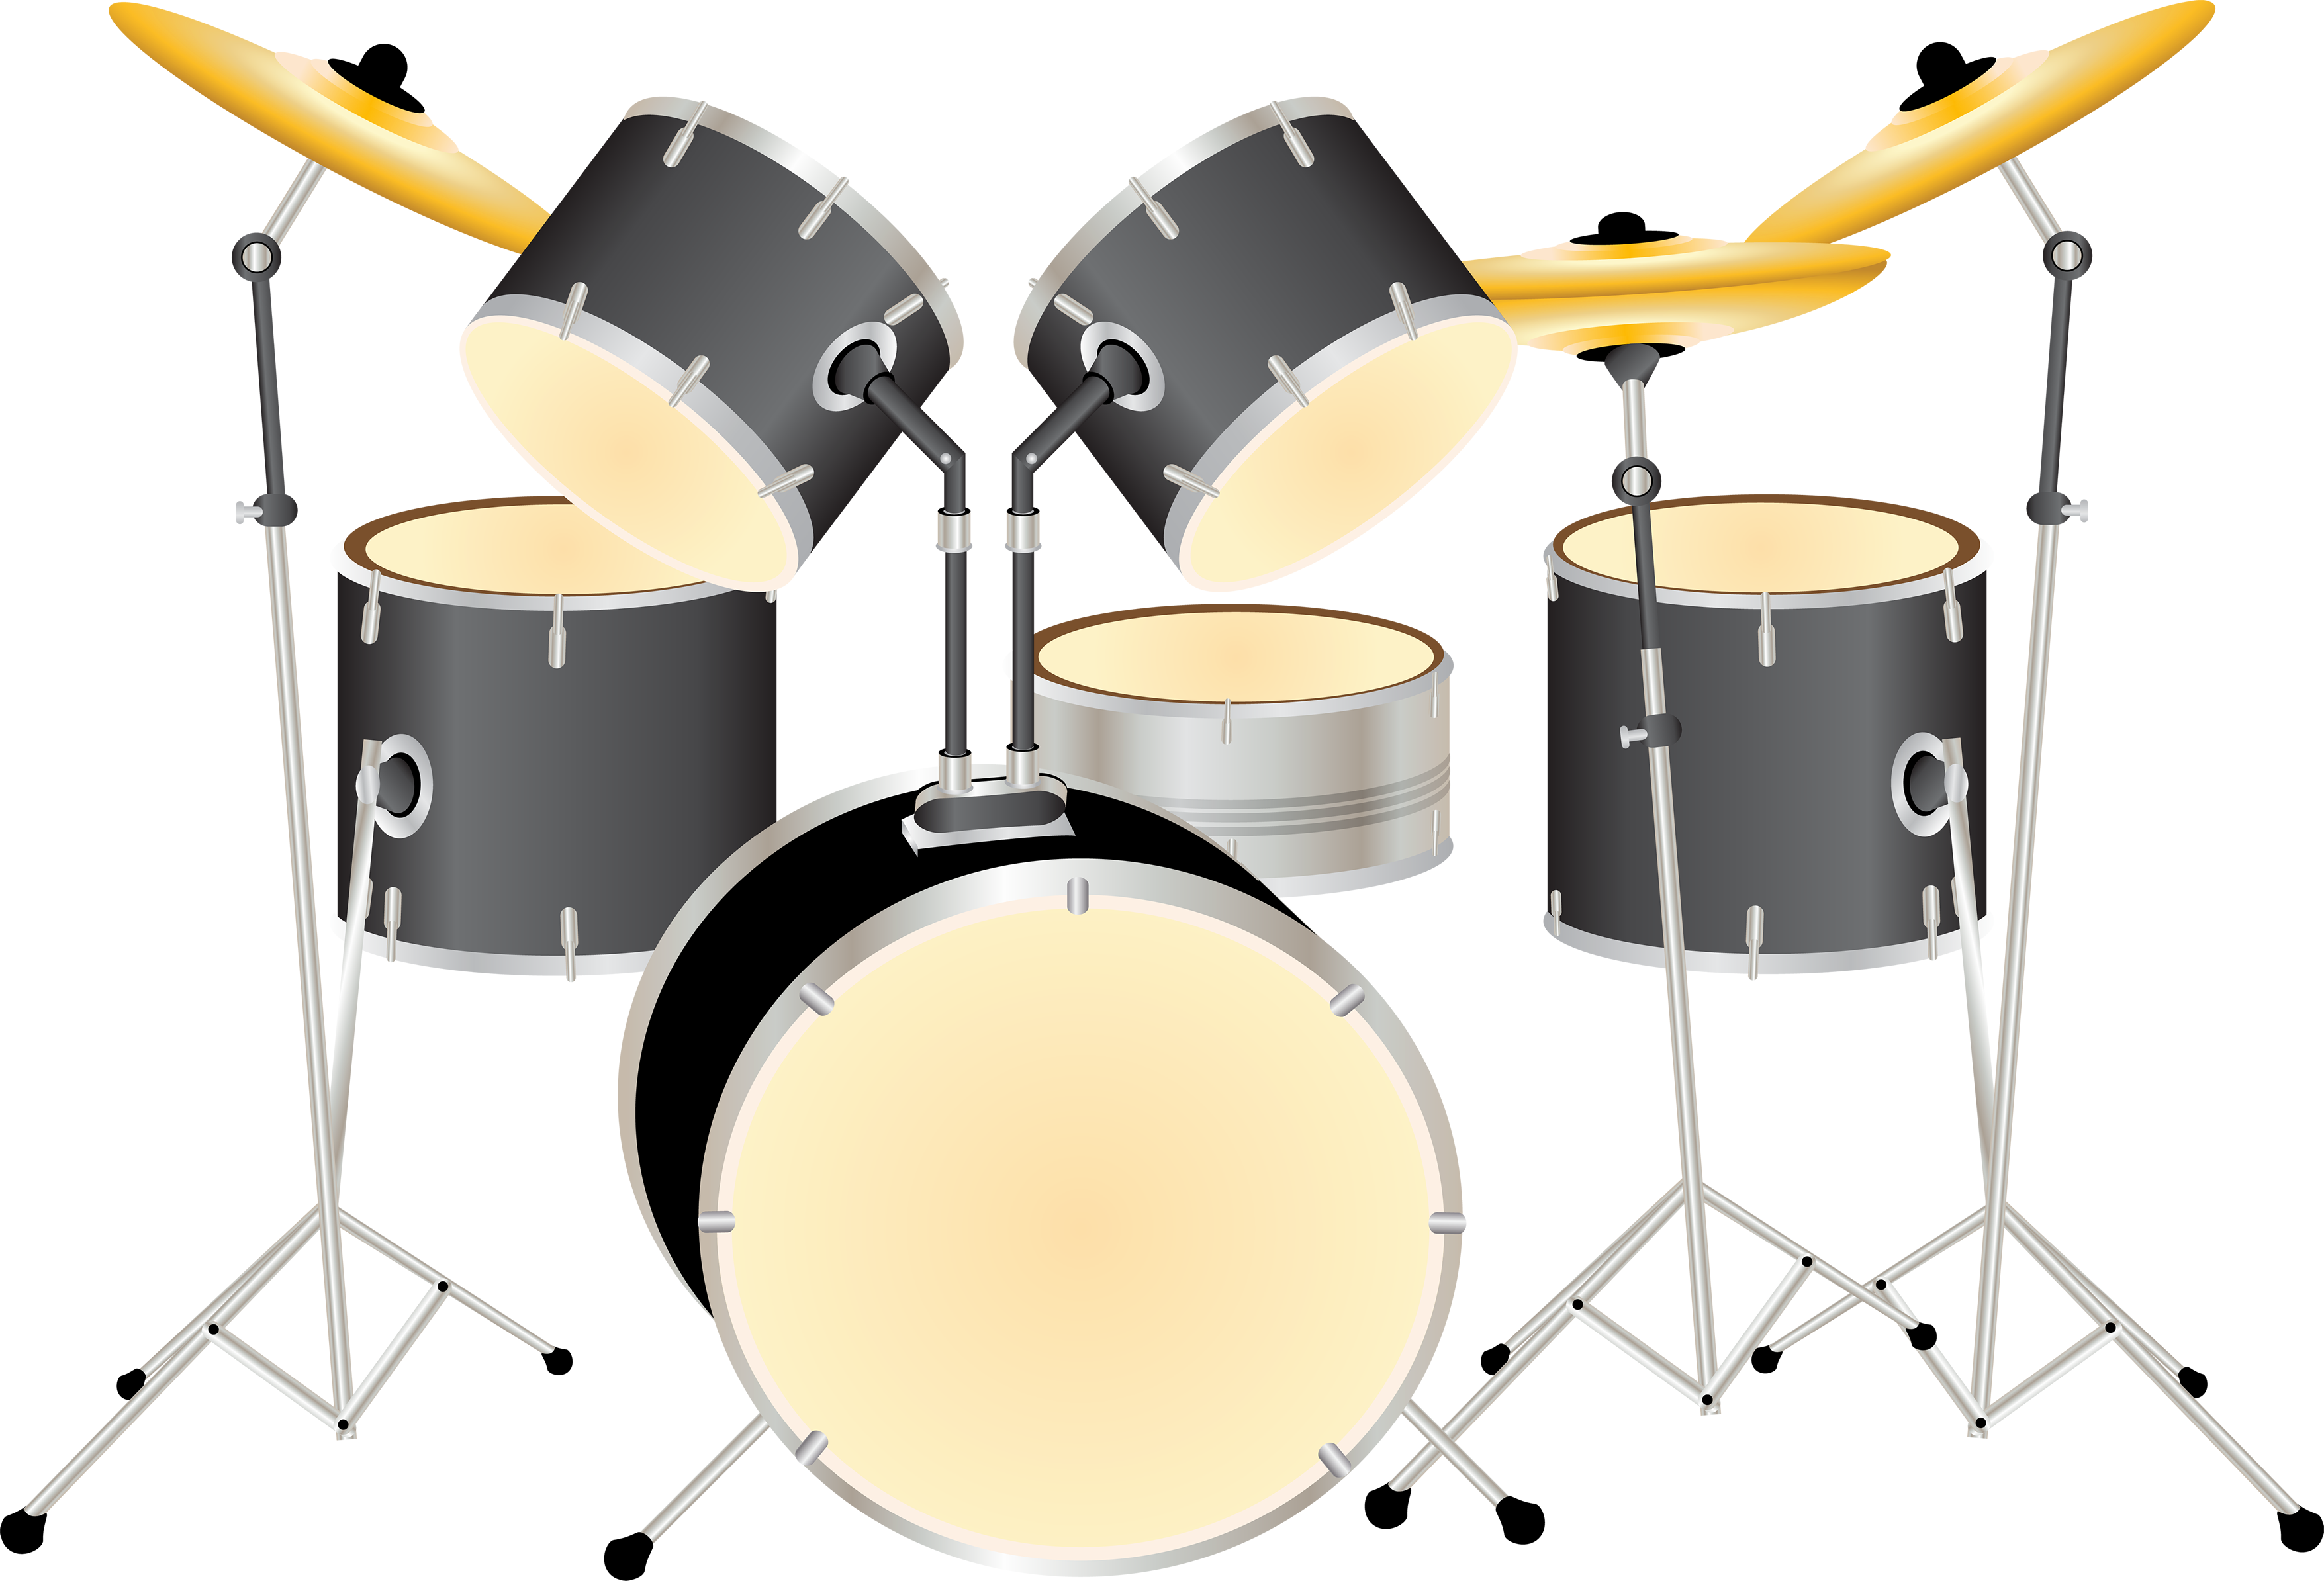 Drums Kit Png Image Drum Kits Drums Transparent